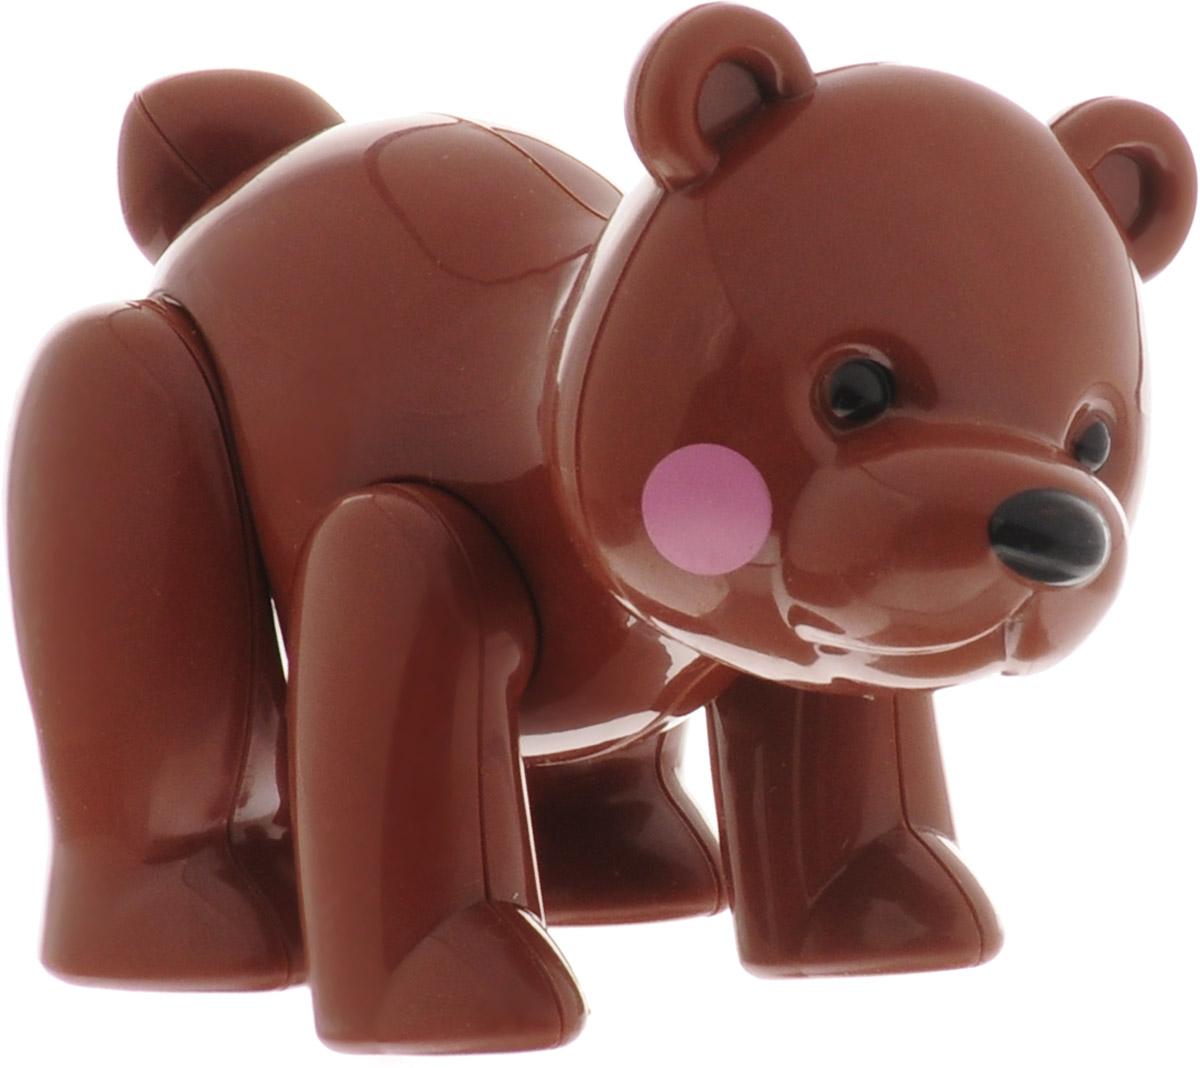 Ути-Пути Развивающая игрушка Медведь